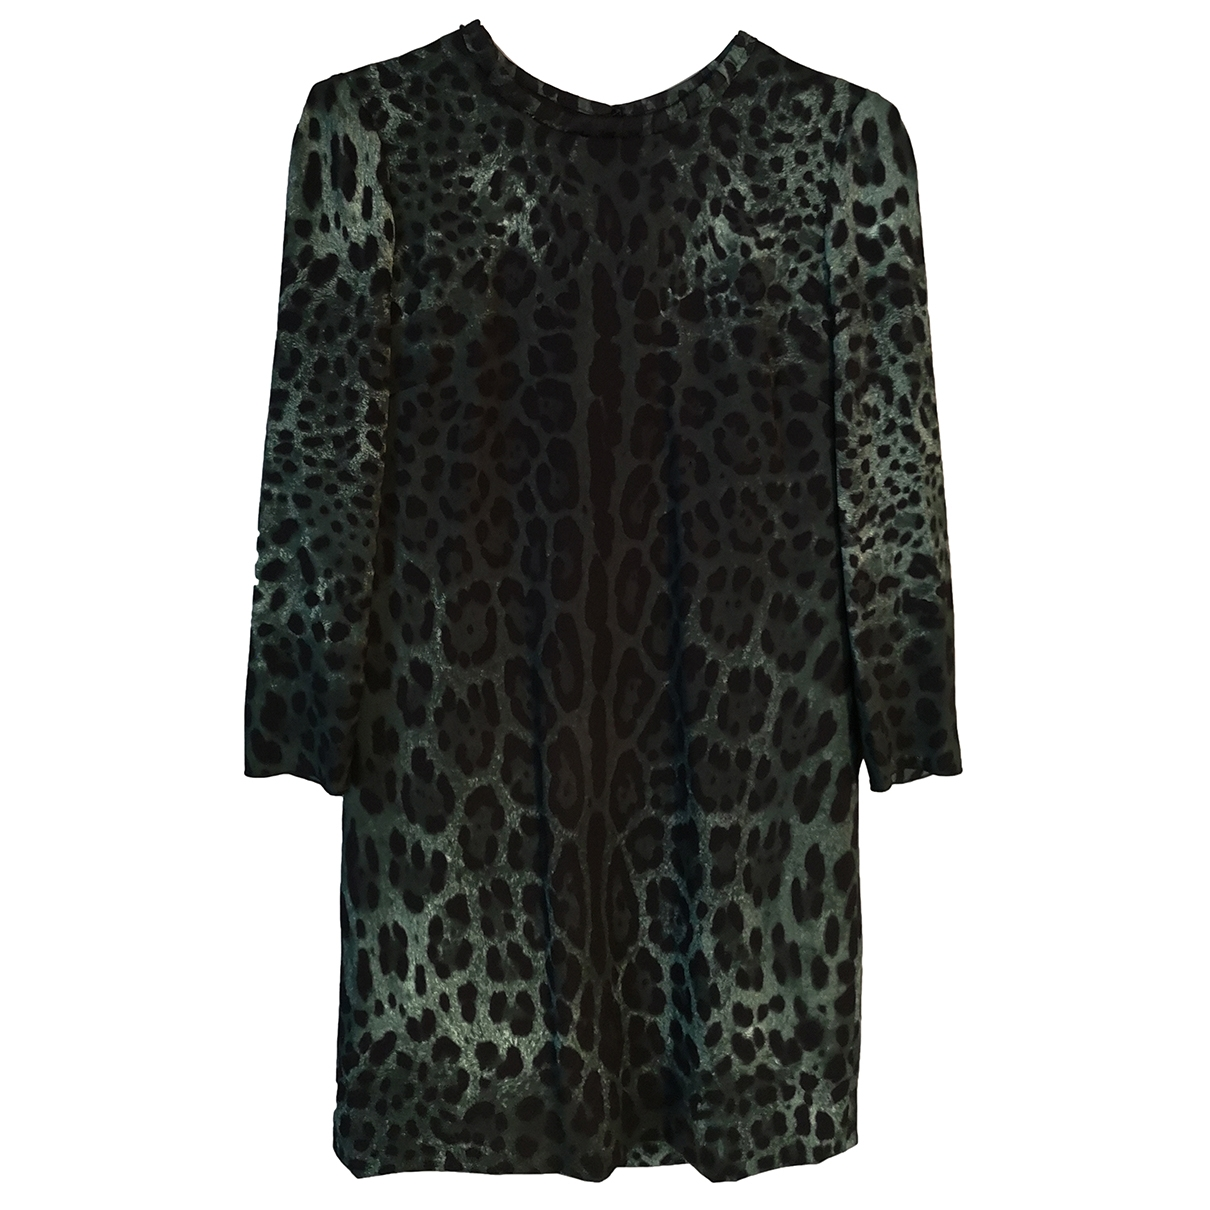 Dolce & Gabbana \N Green Silk dress for Women 38 IT